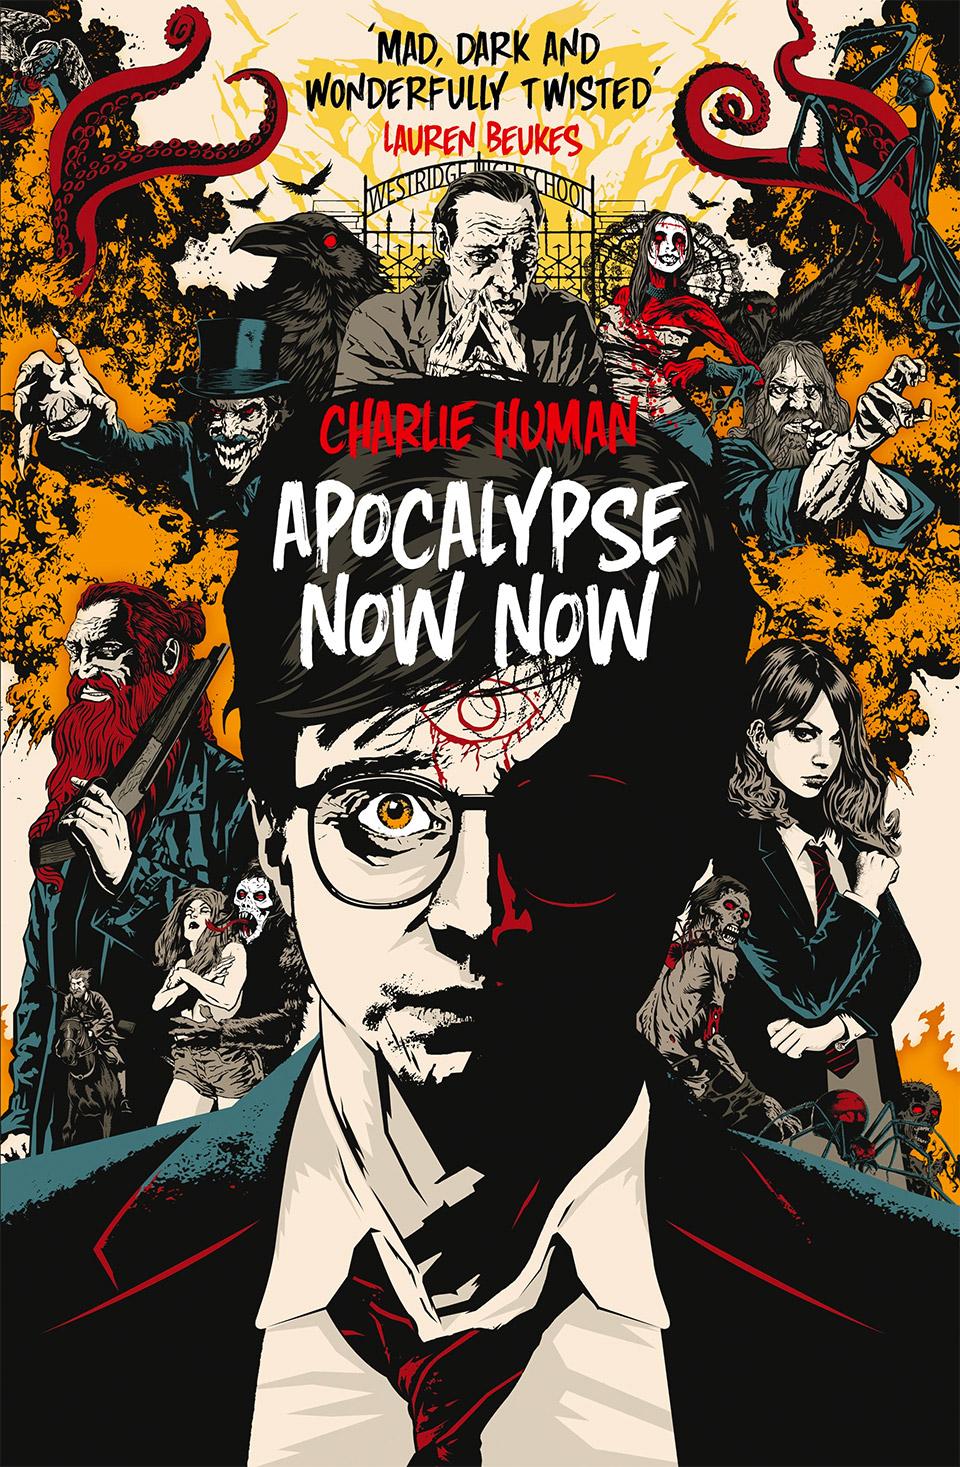 Apocalypse Now Now (Teaser)